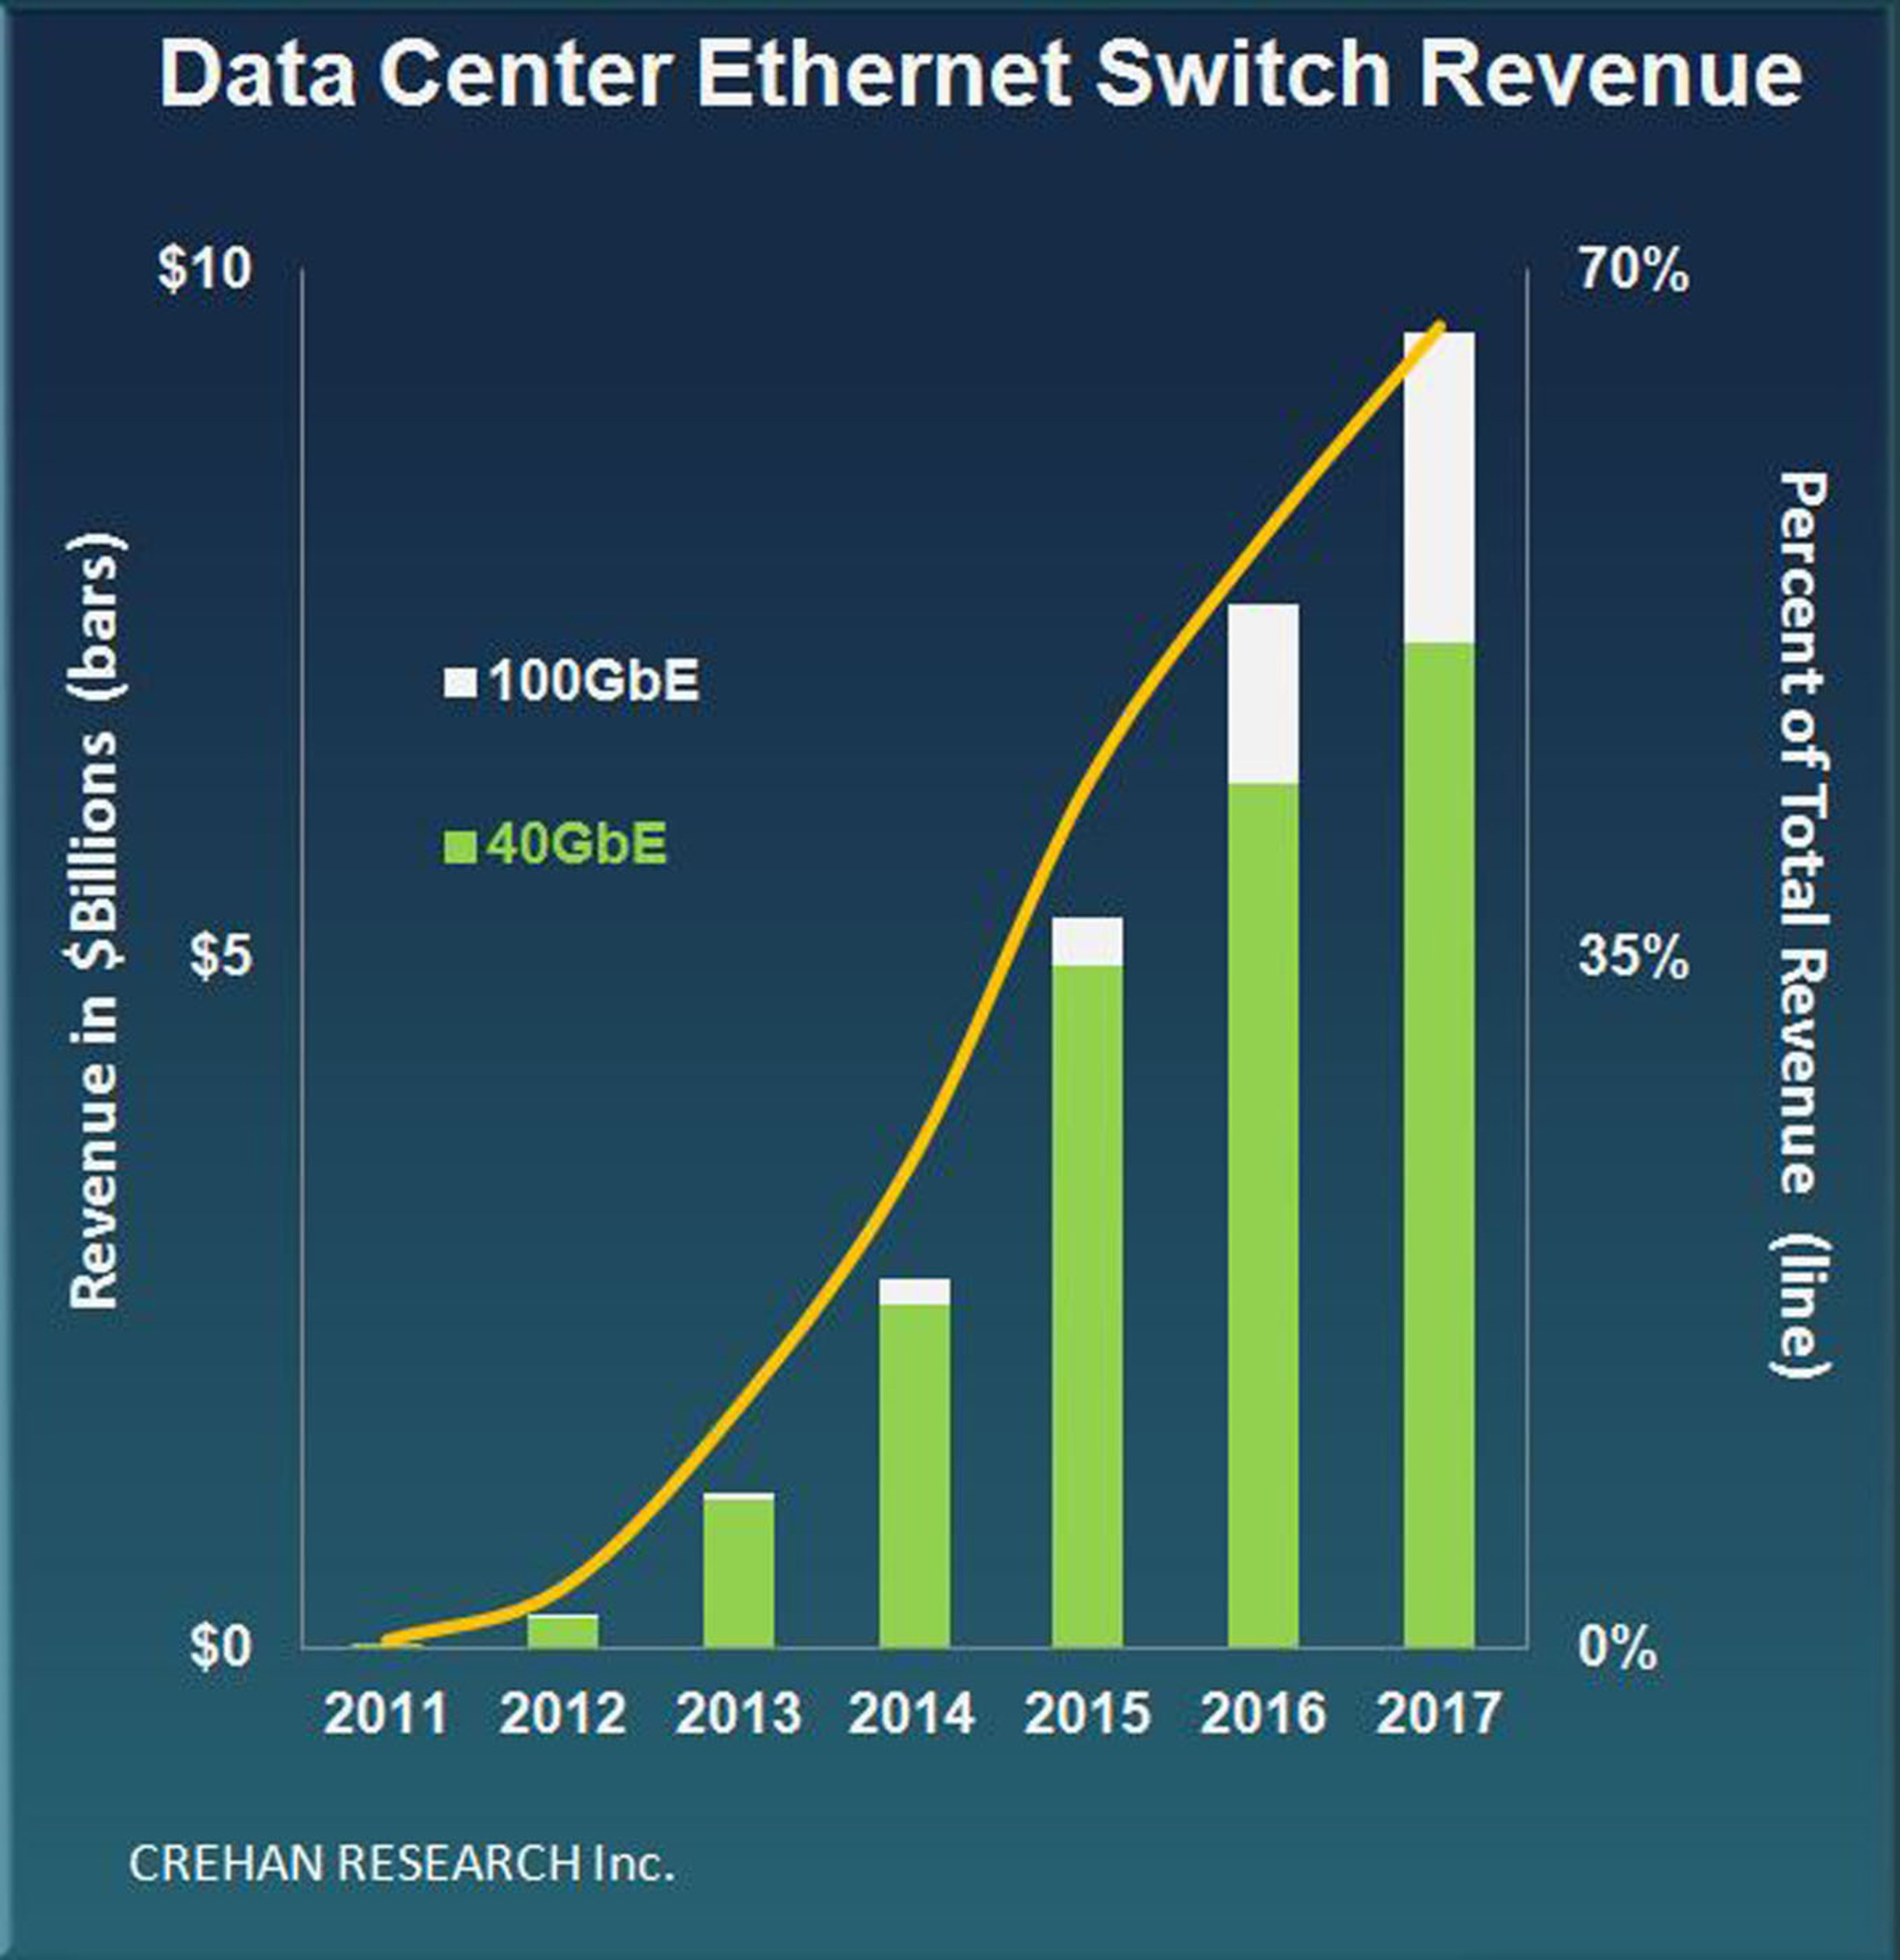 Next-Gen Switches to Propel Data Center Beyond 10 Gigabit Era, According to Crehan Research